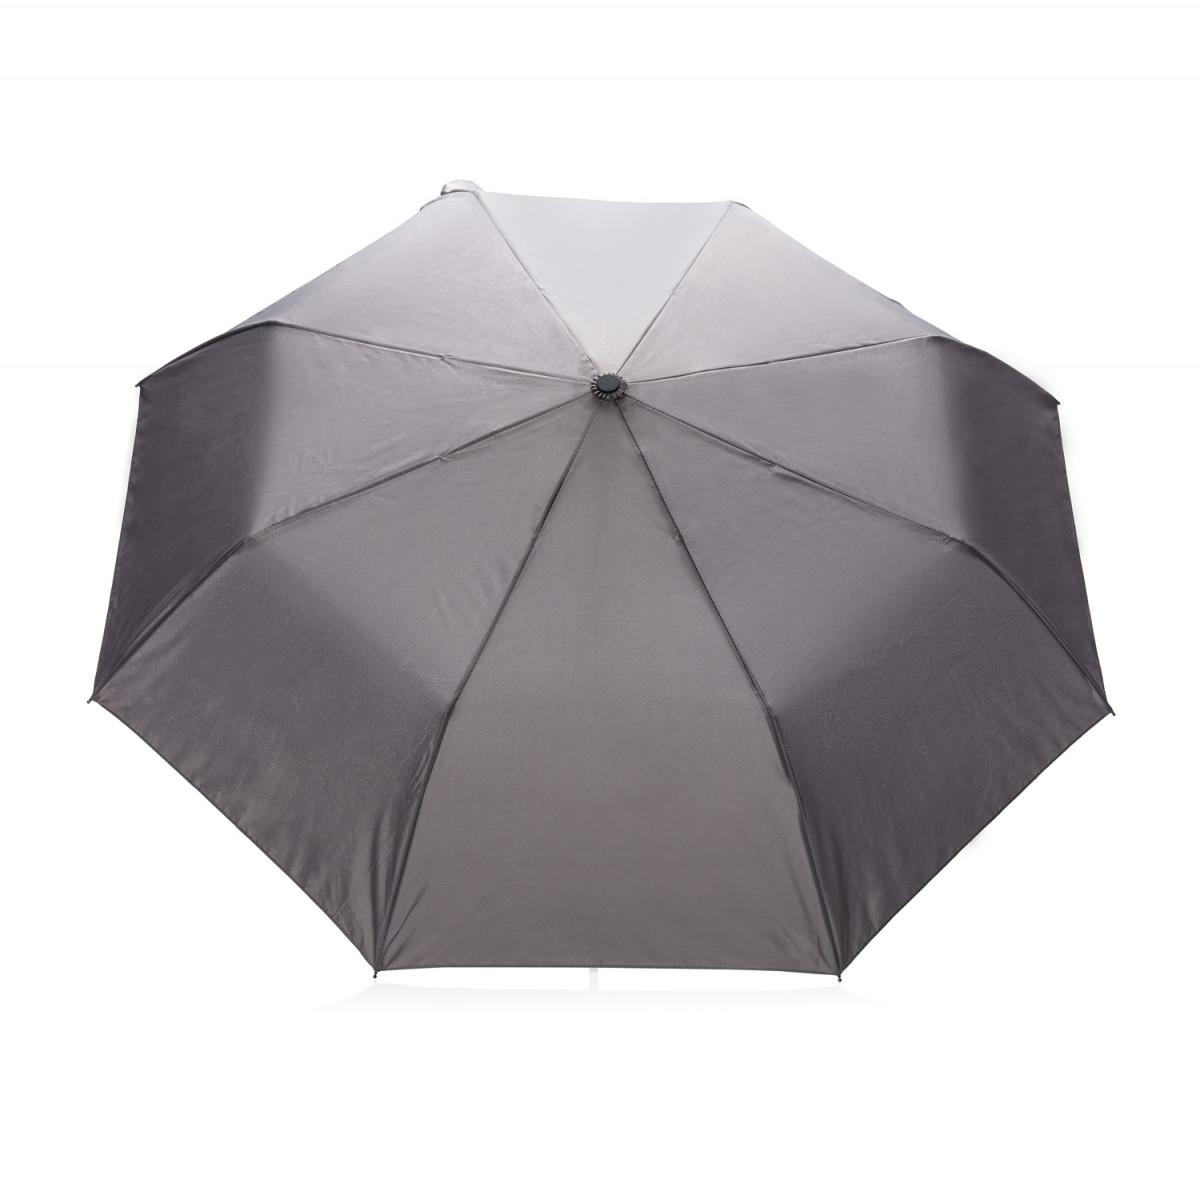 "Складной зонт зонт-полуавтомат  Deluxe 21"",серый"